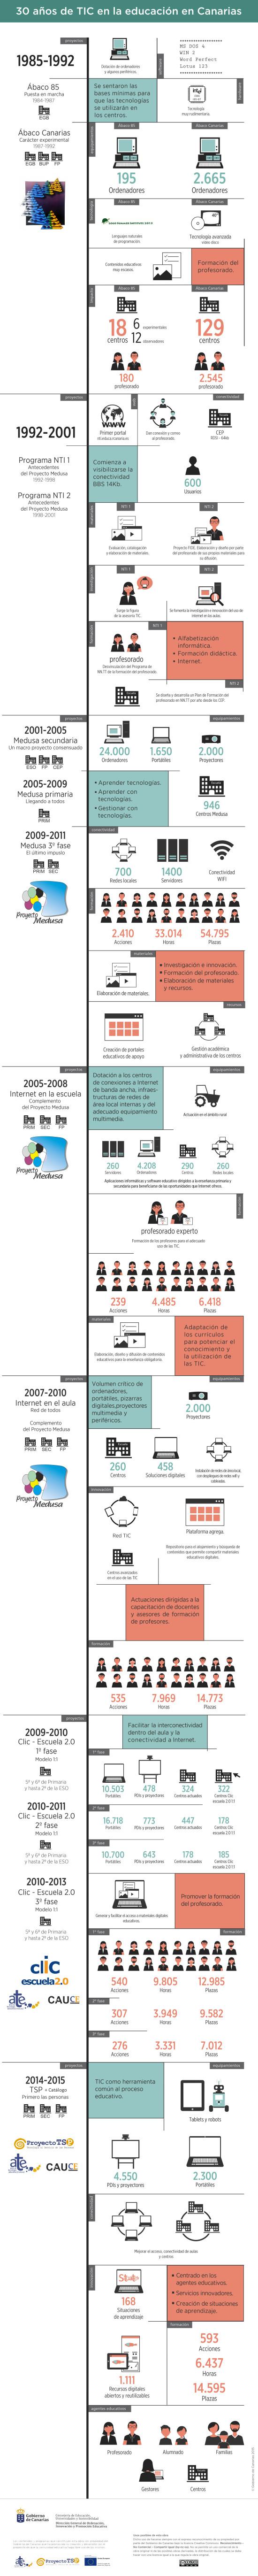 Infografia-ATE_V2-550x5488